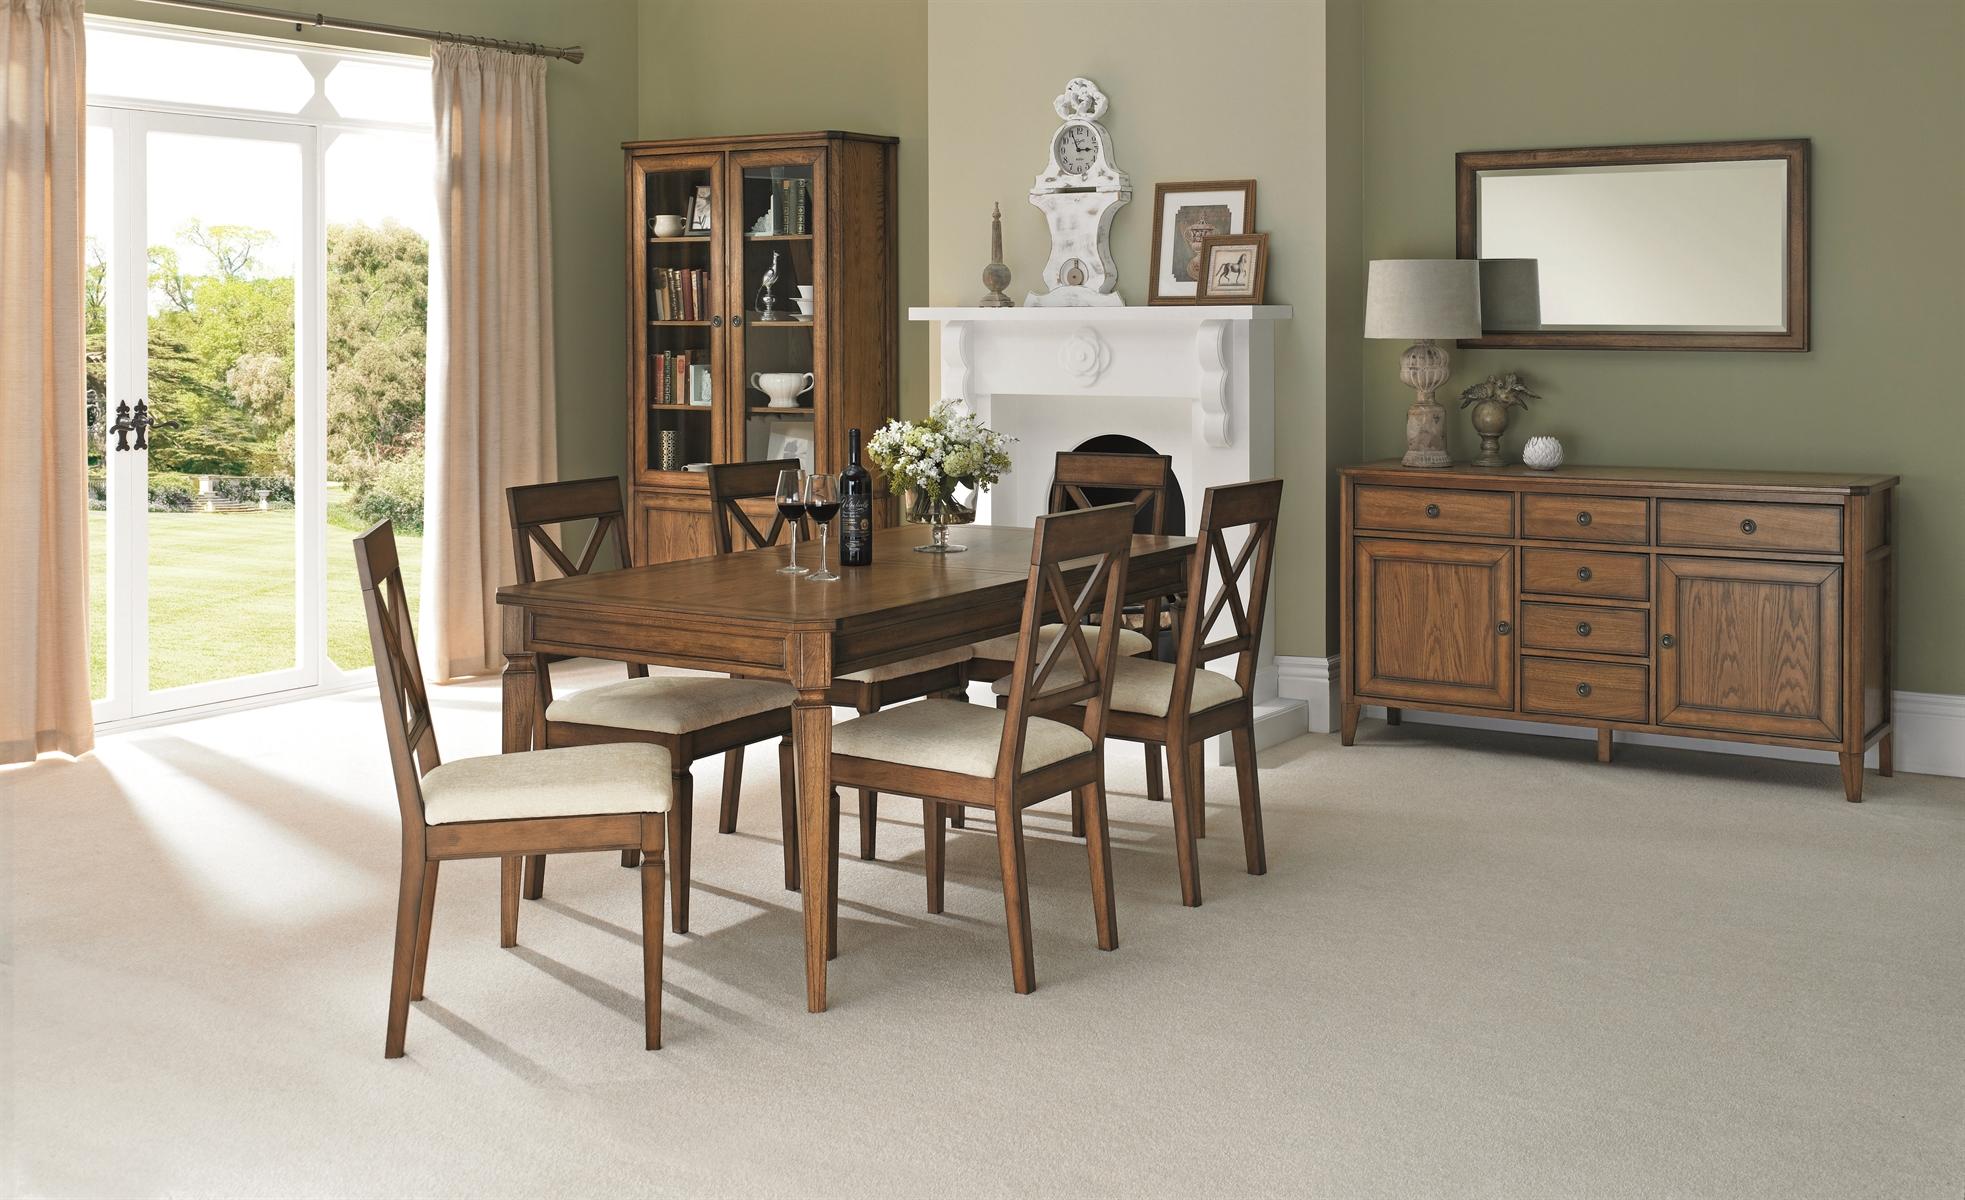 Oak dining room furniture sale